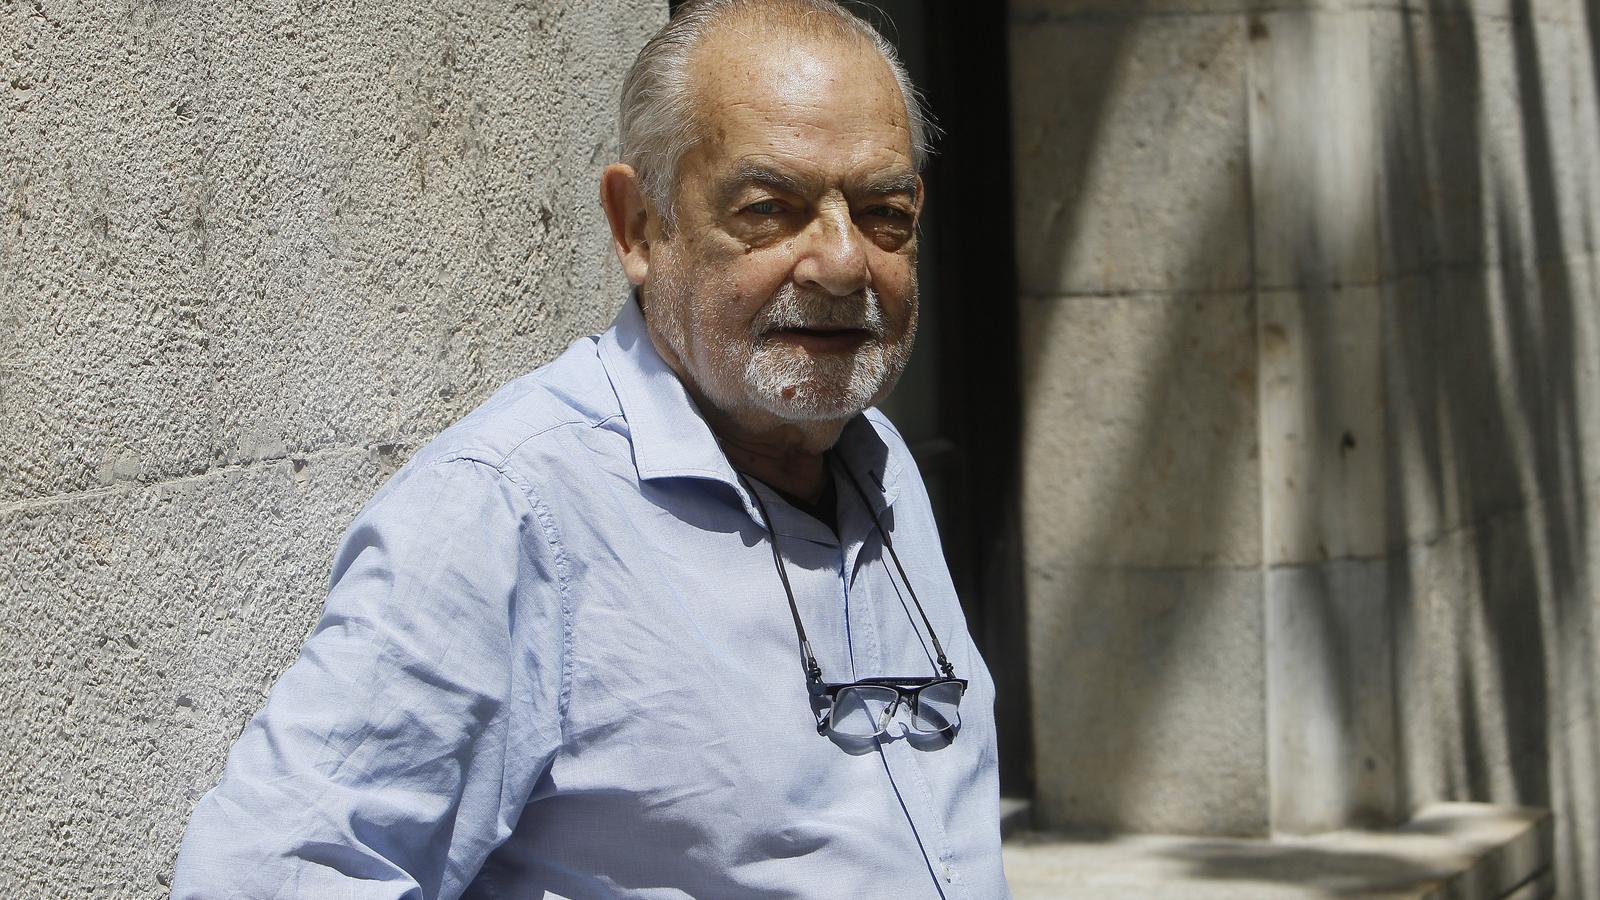 El sociòleg Antoni Tarabini, president de la Fundació Gadeso.